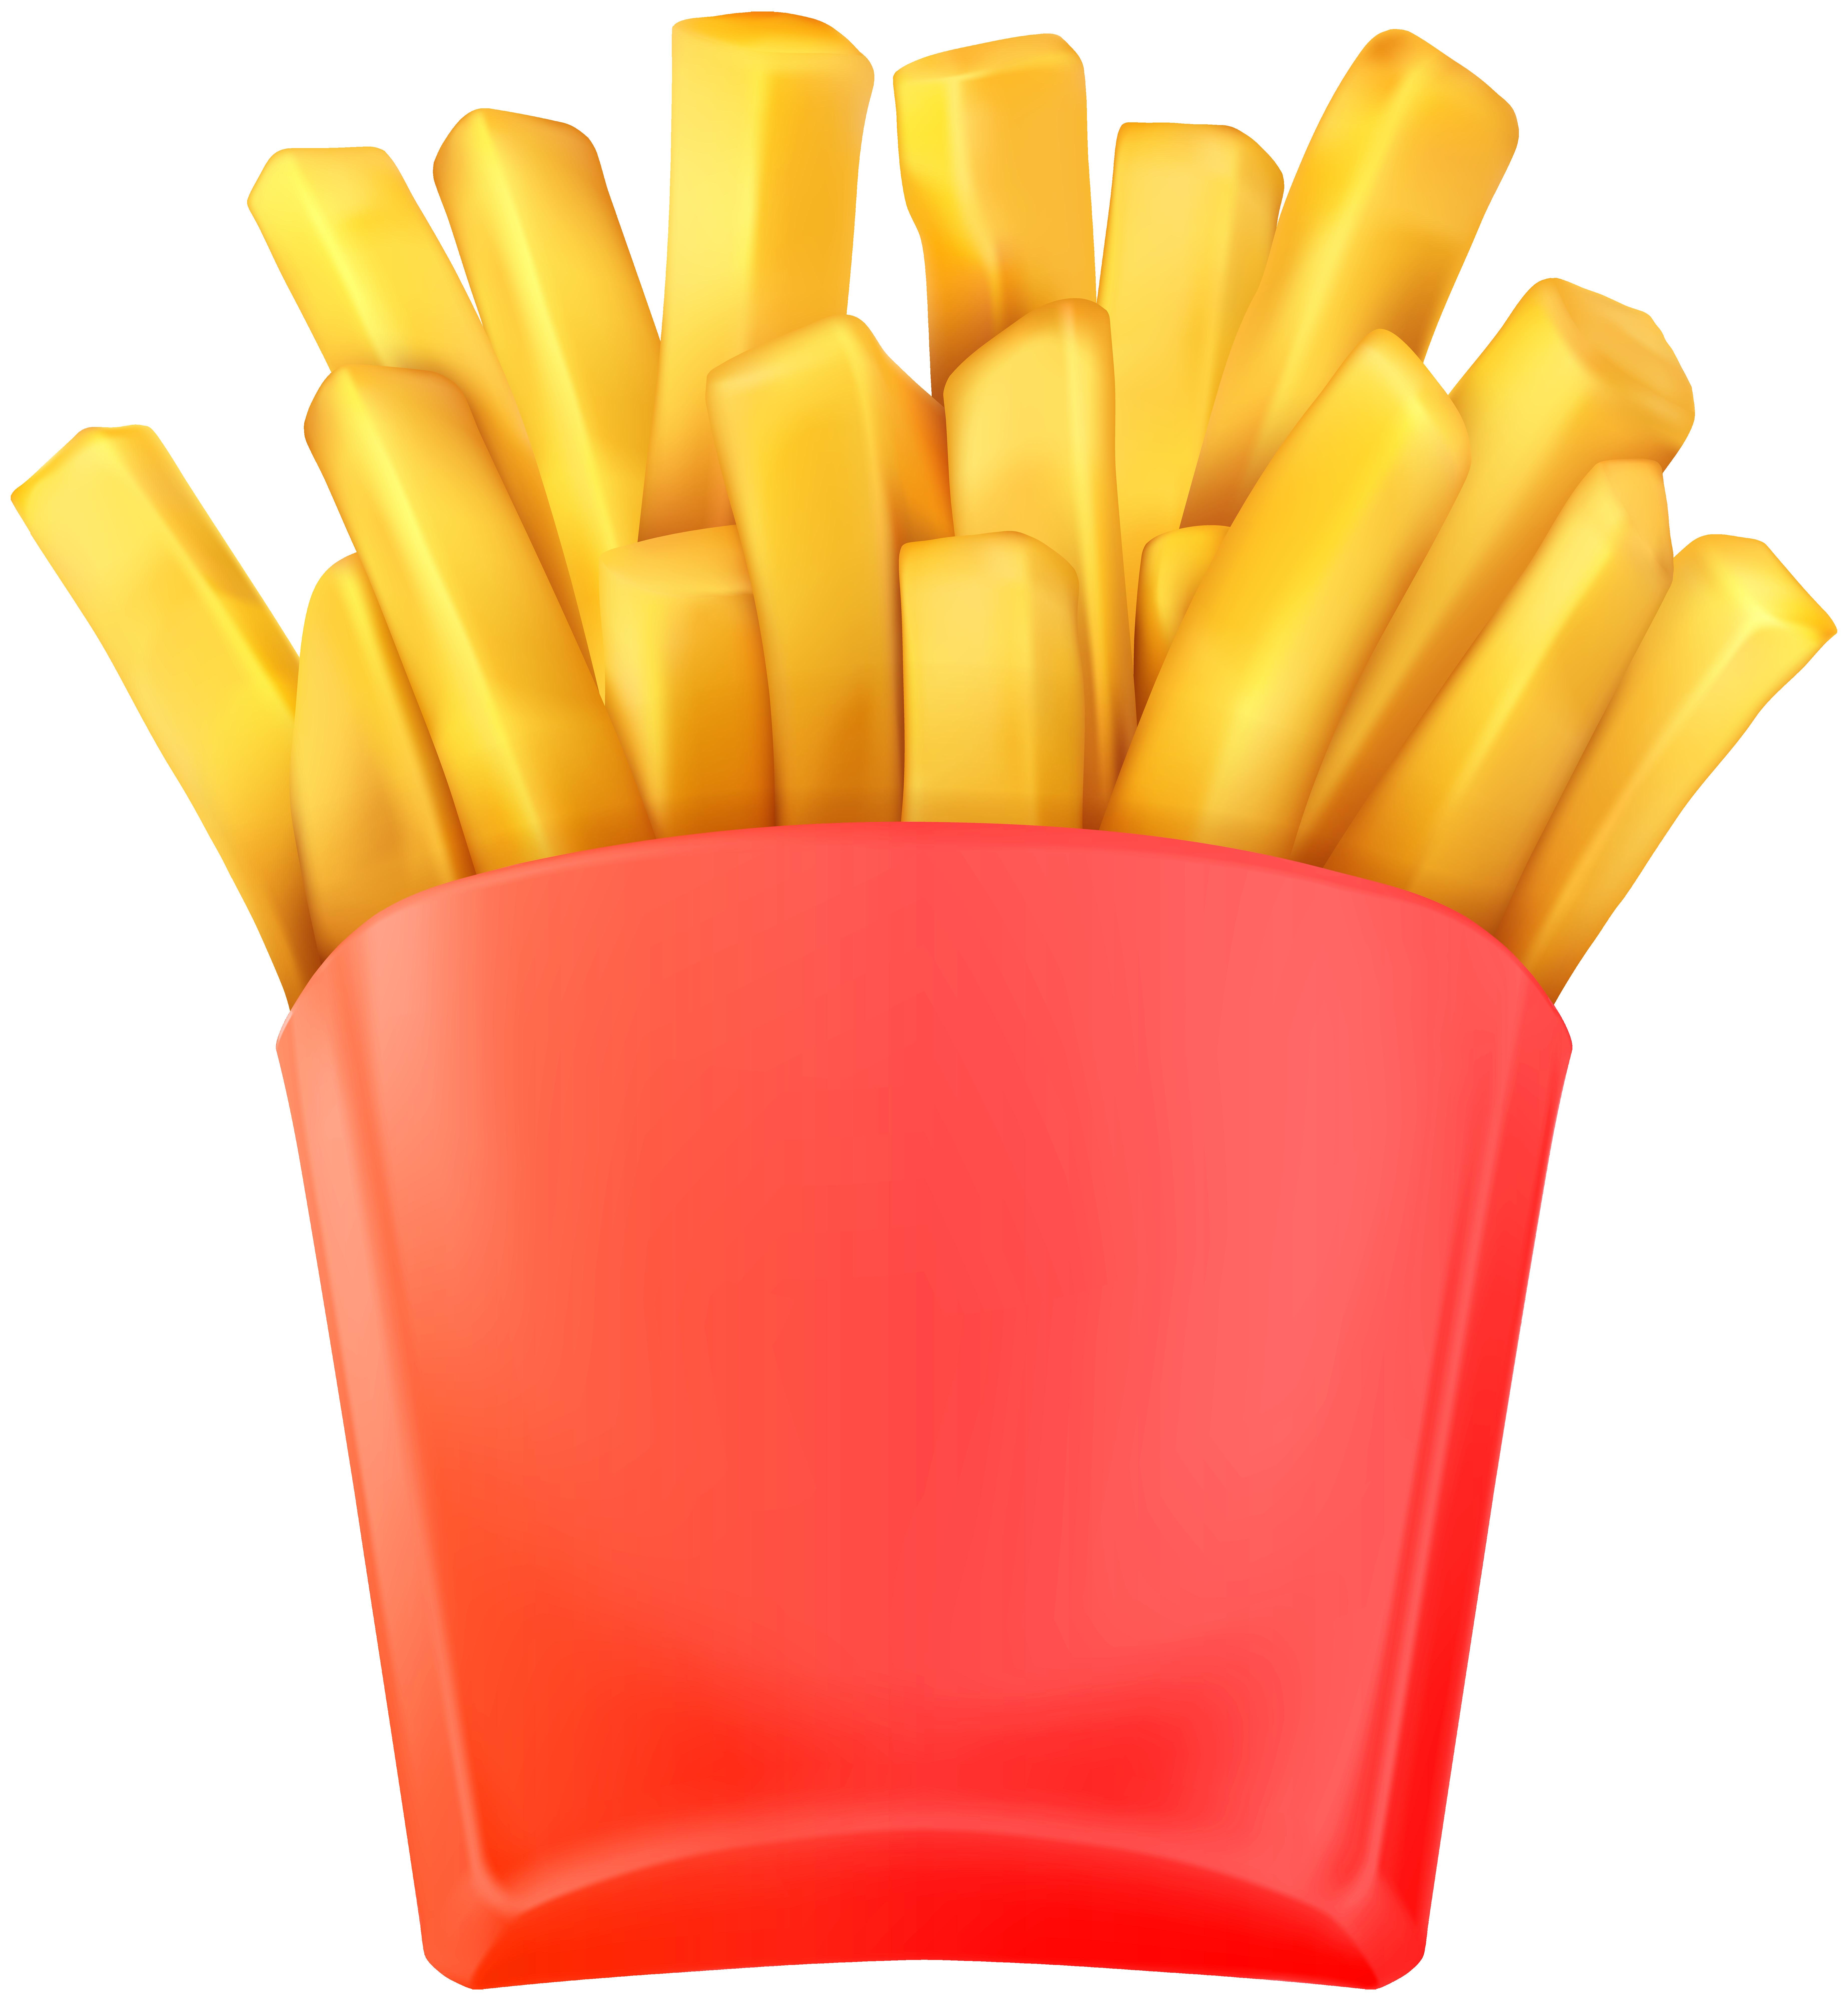 7389x8000 French Fries Hamburger Fast Food Junk Clip Art Cliparts Fine